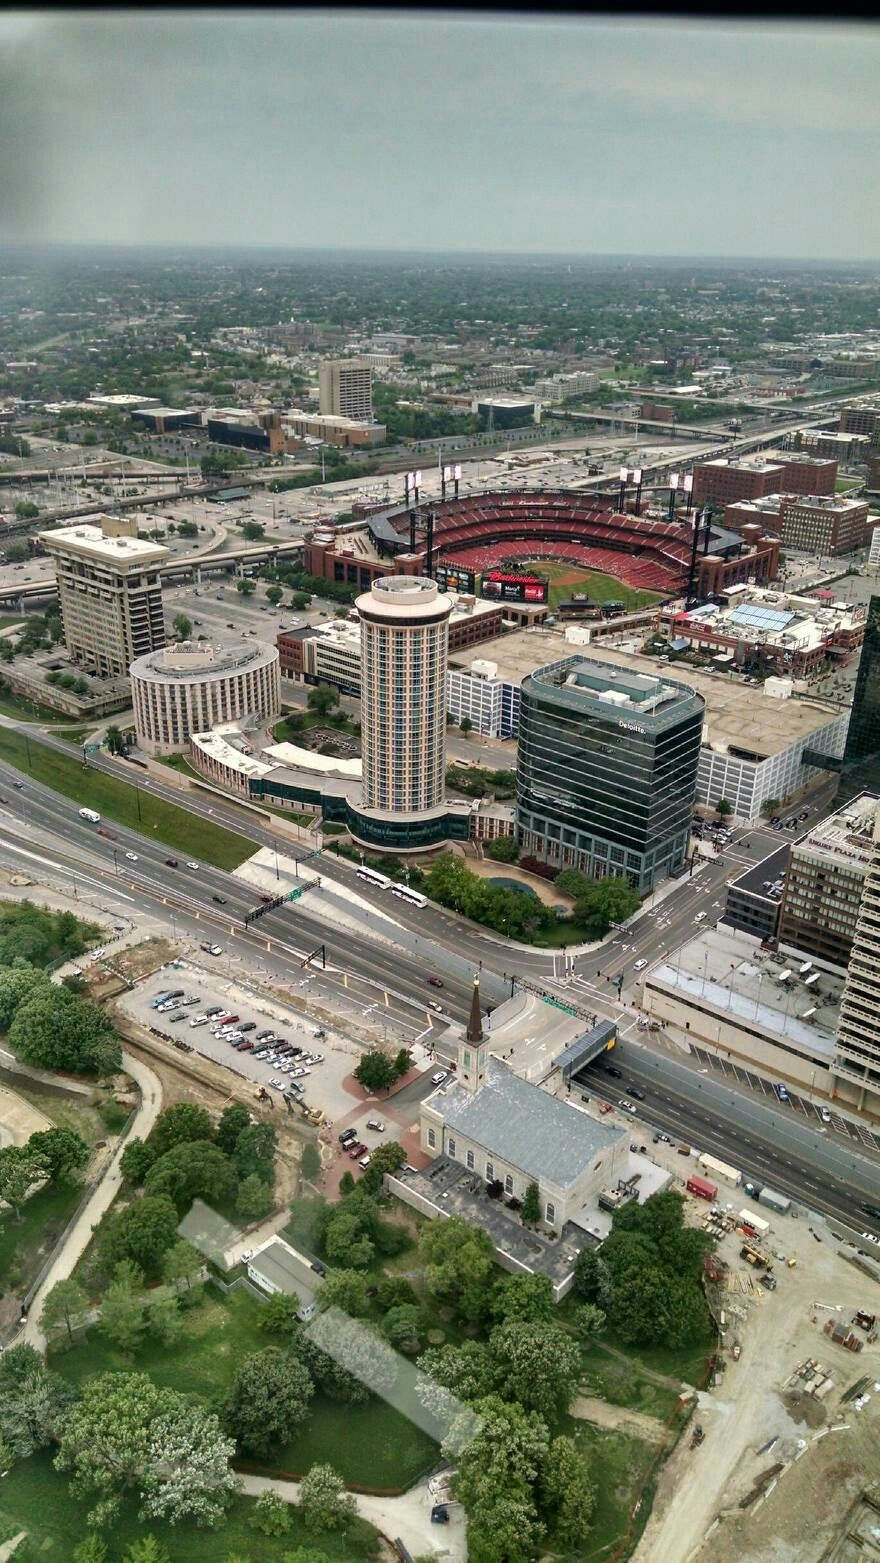 Busch Stadium seen from the Arch